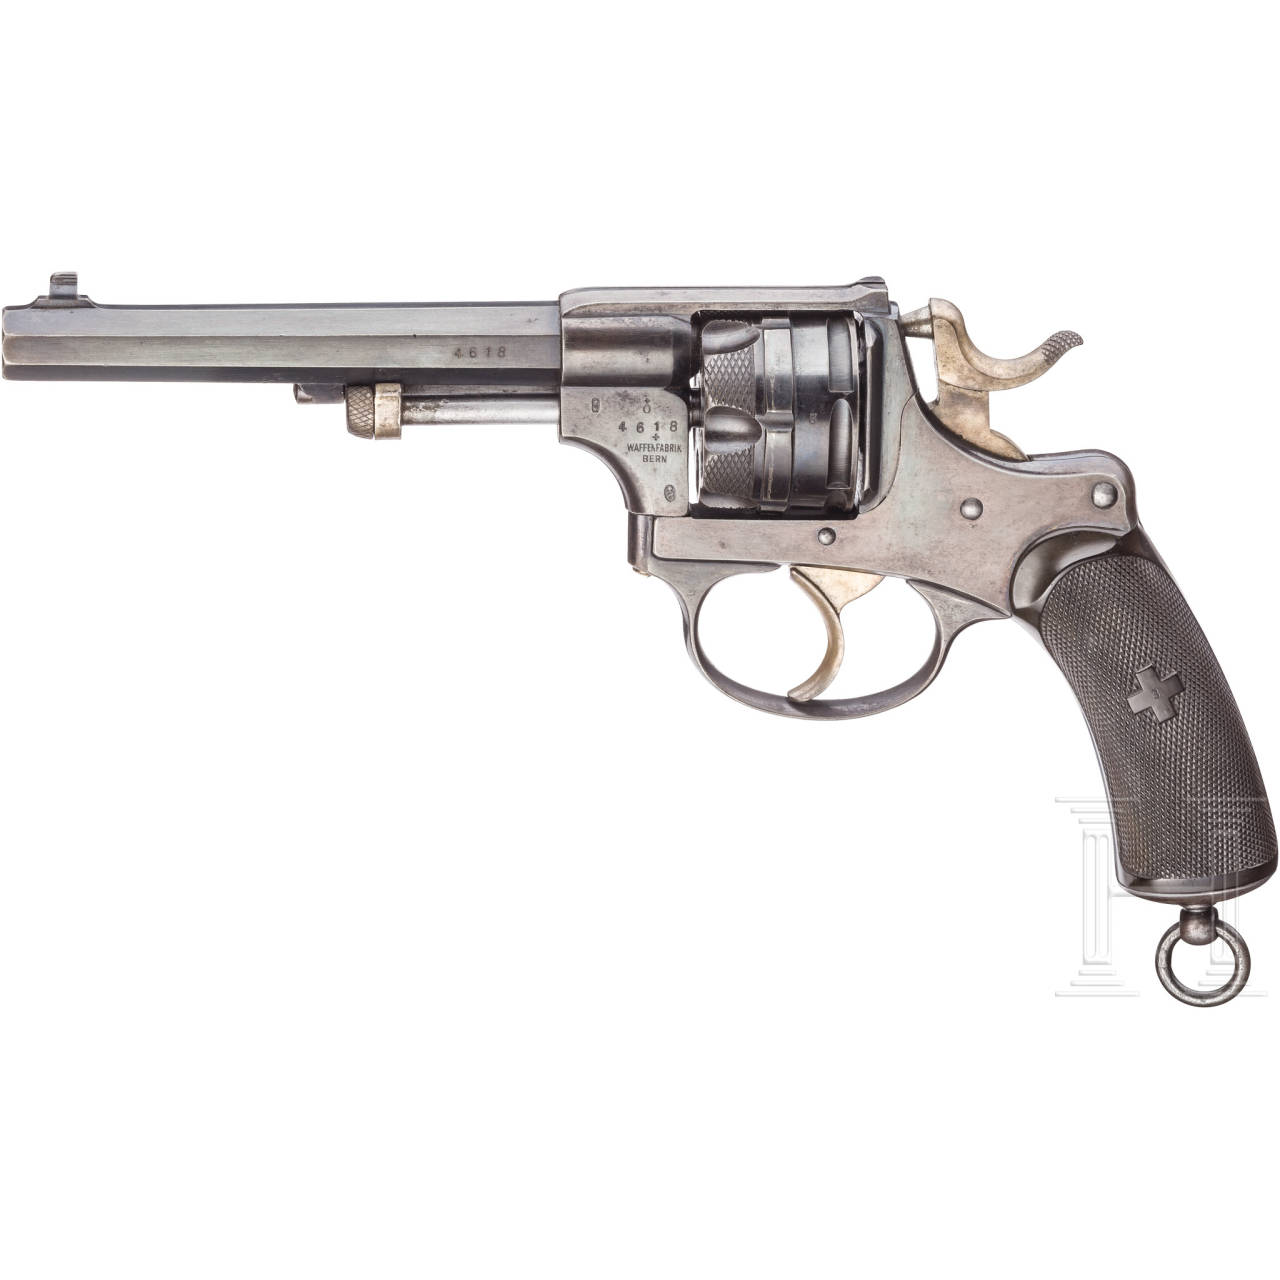 Revolver, Waffenfabrik Bern, Mod. 1878